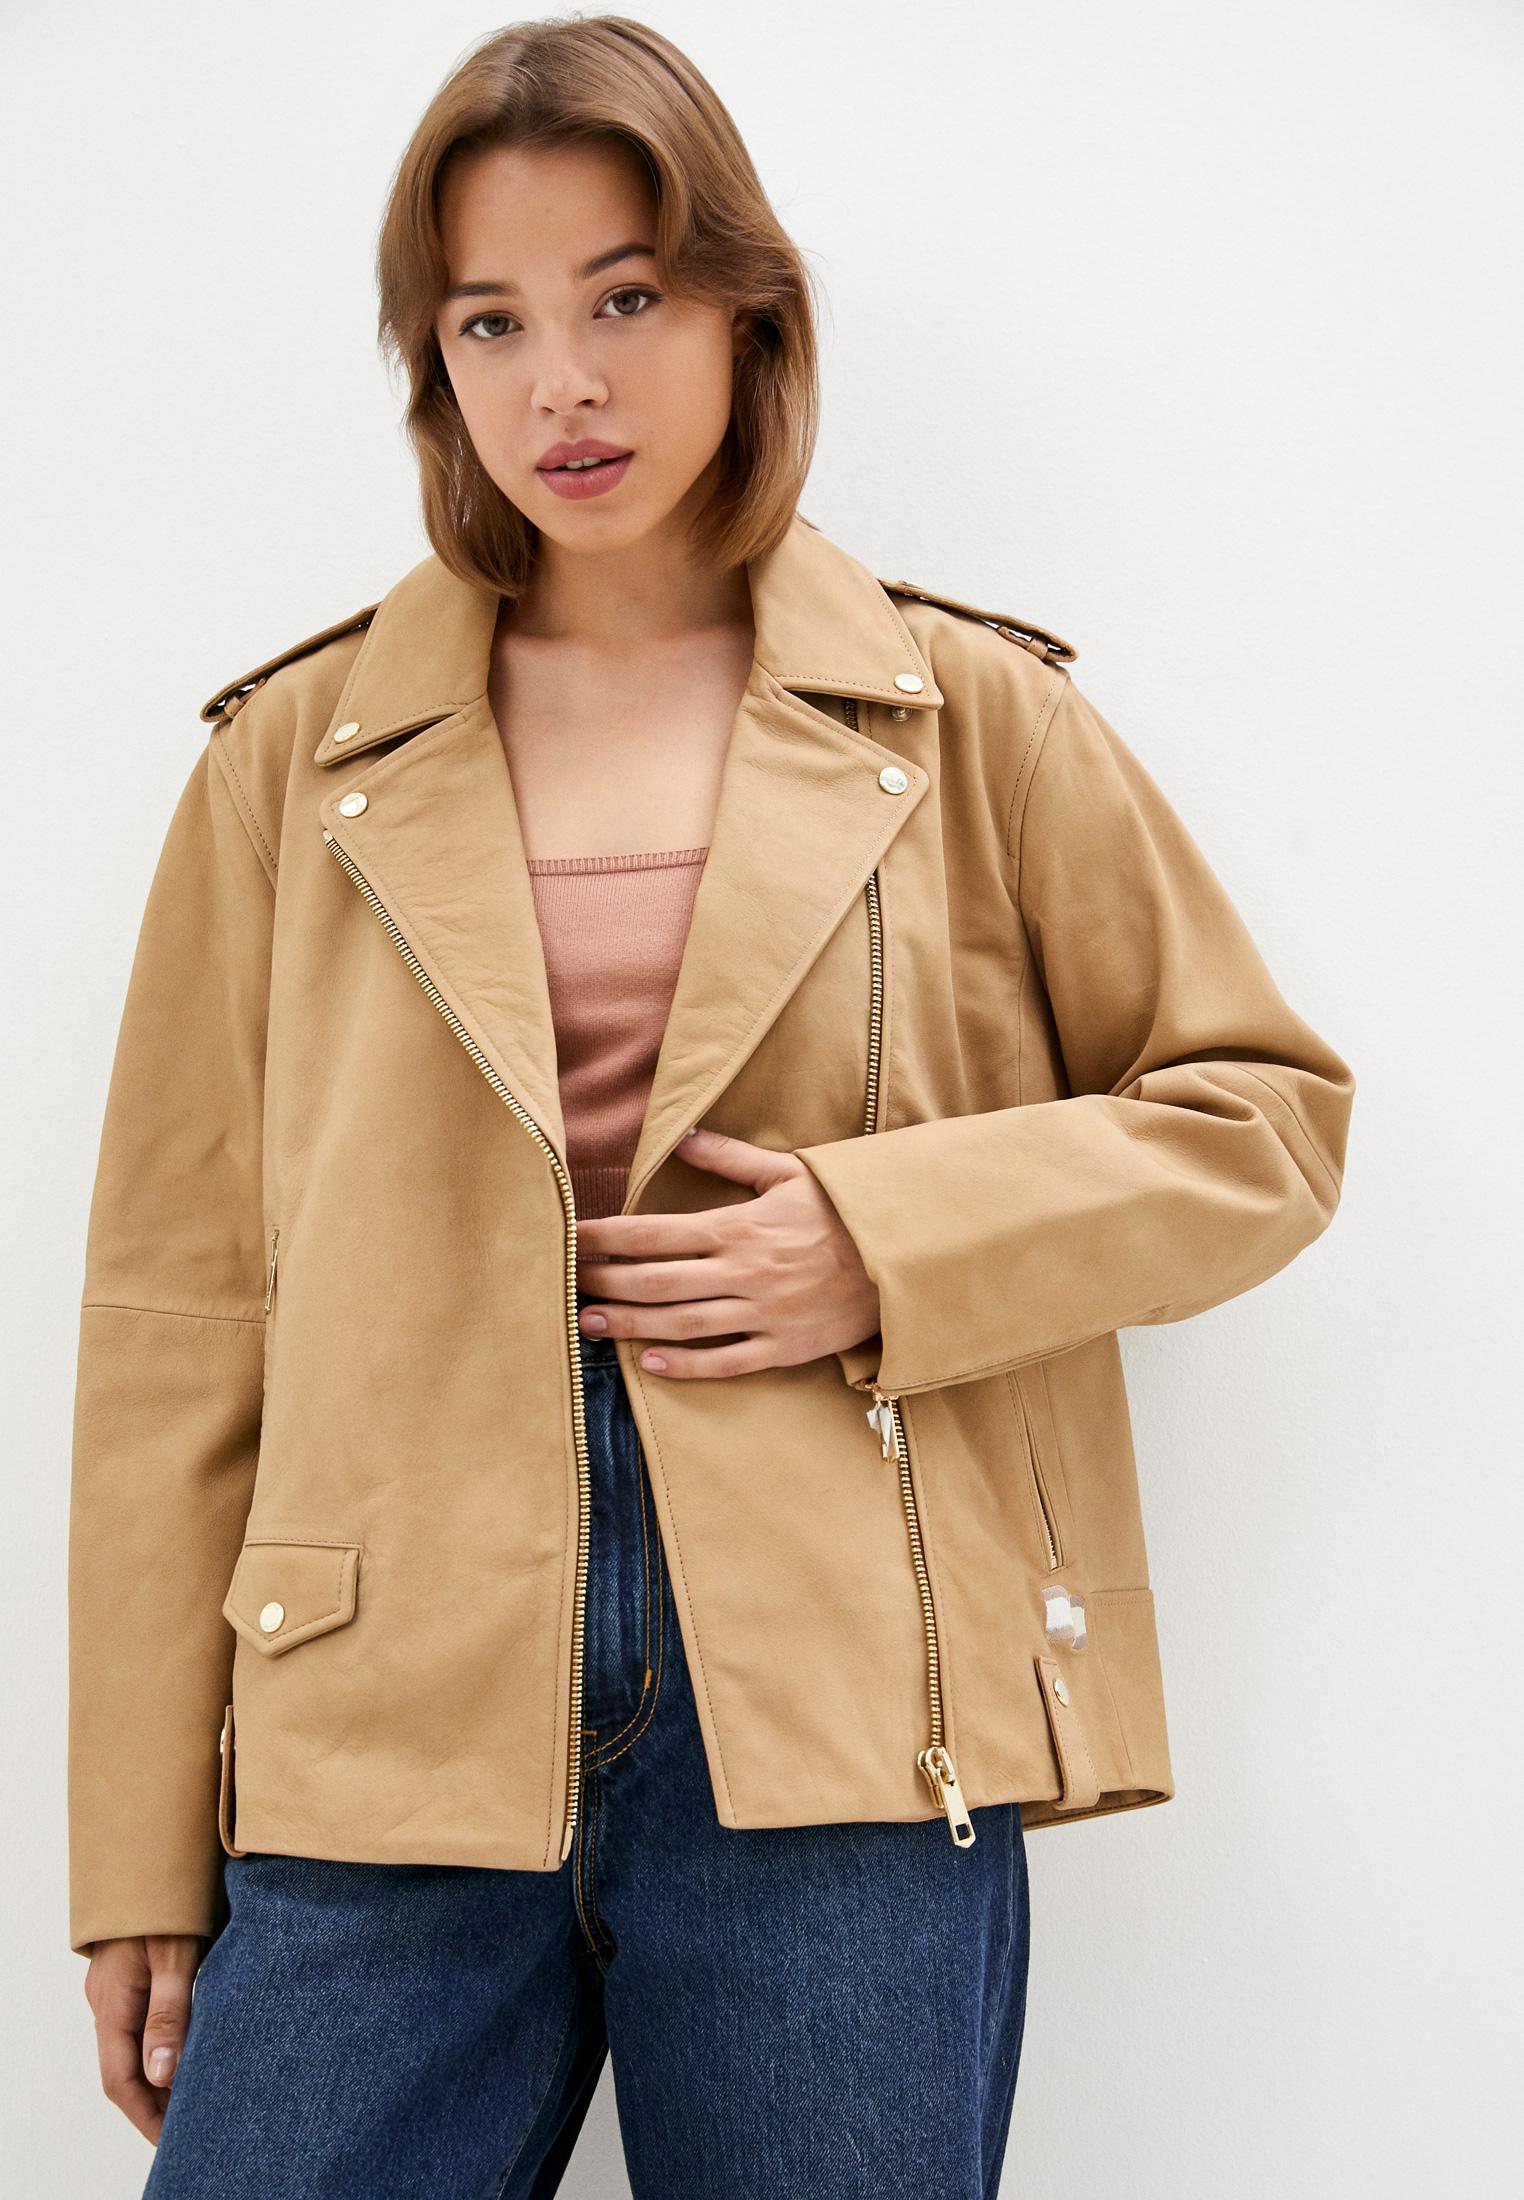 Кожаная куртка Tommy Hilfiger (Томми Хилфигер) WW0WW31146